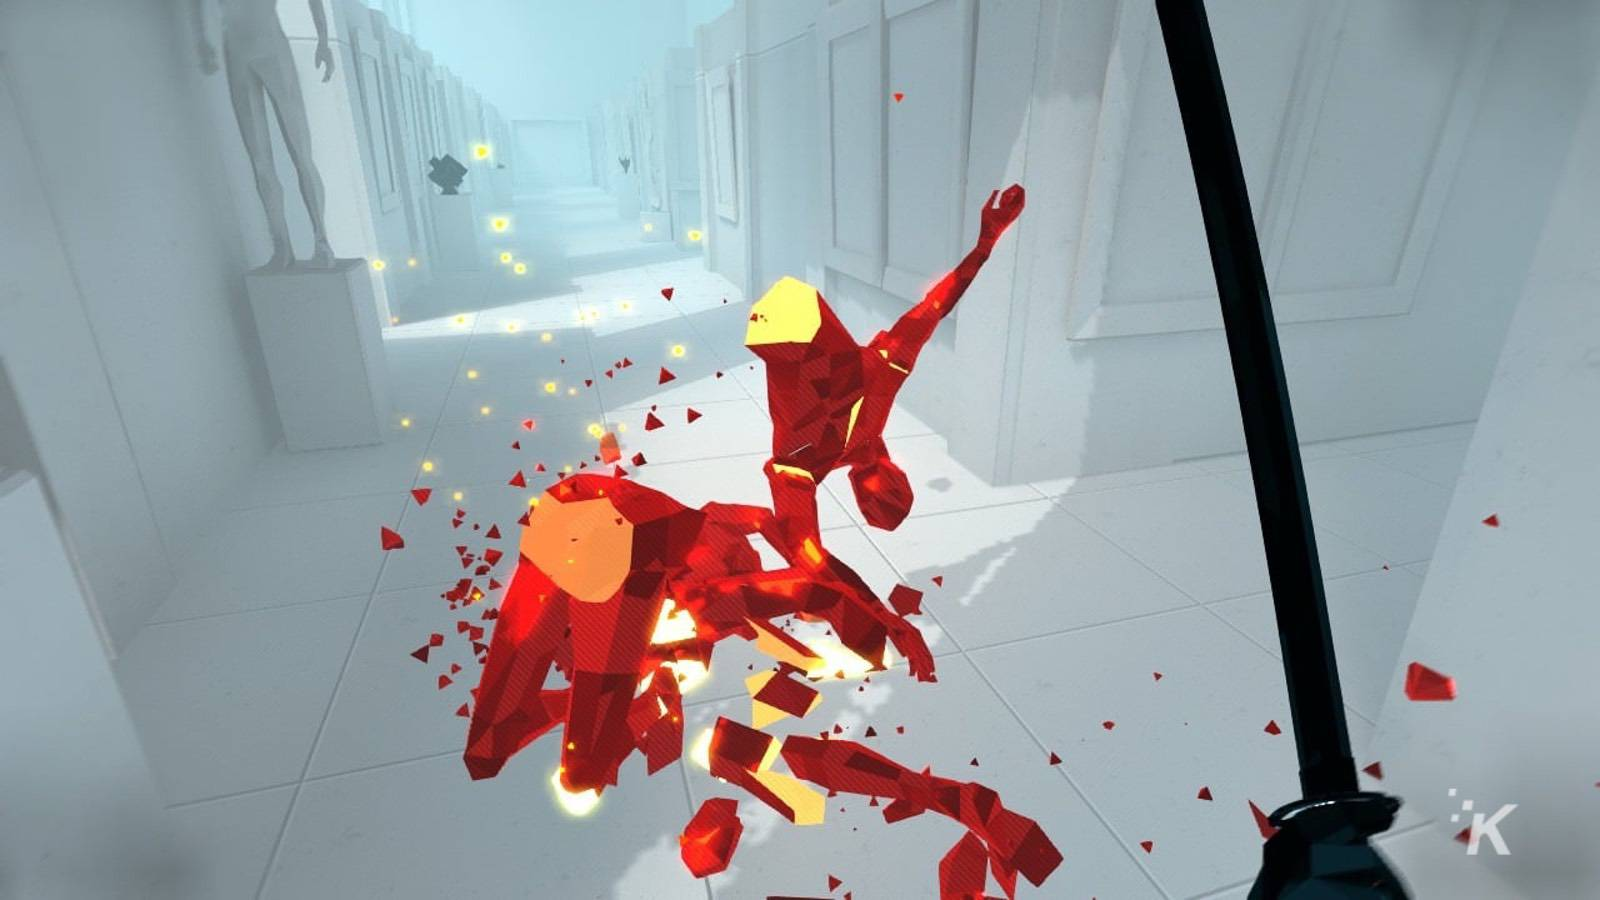 superhot review gameplay